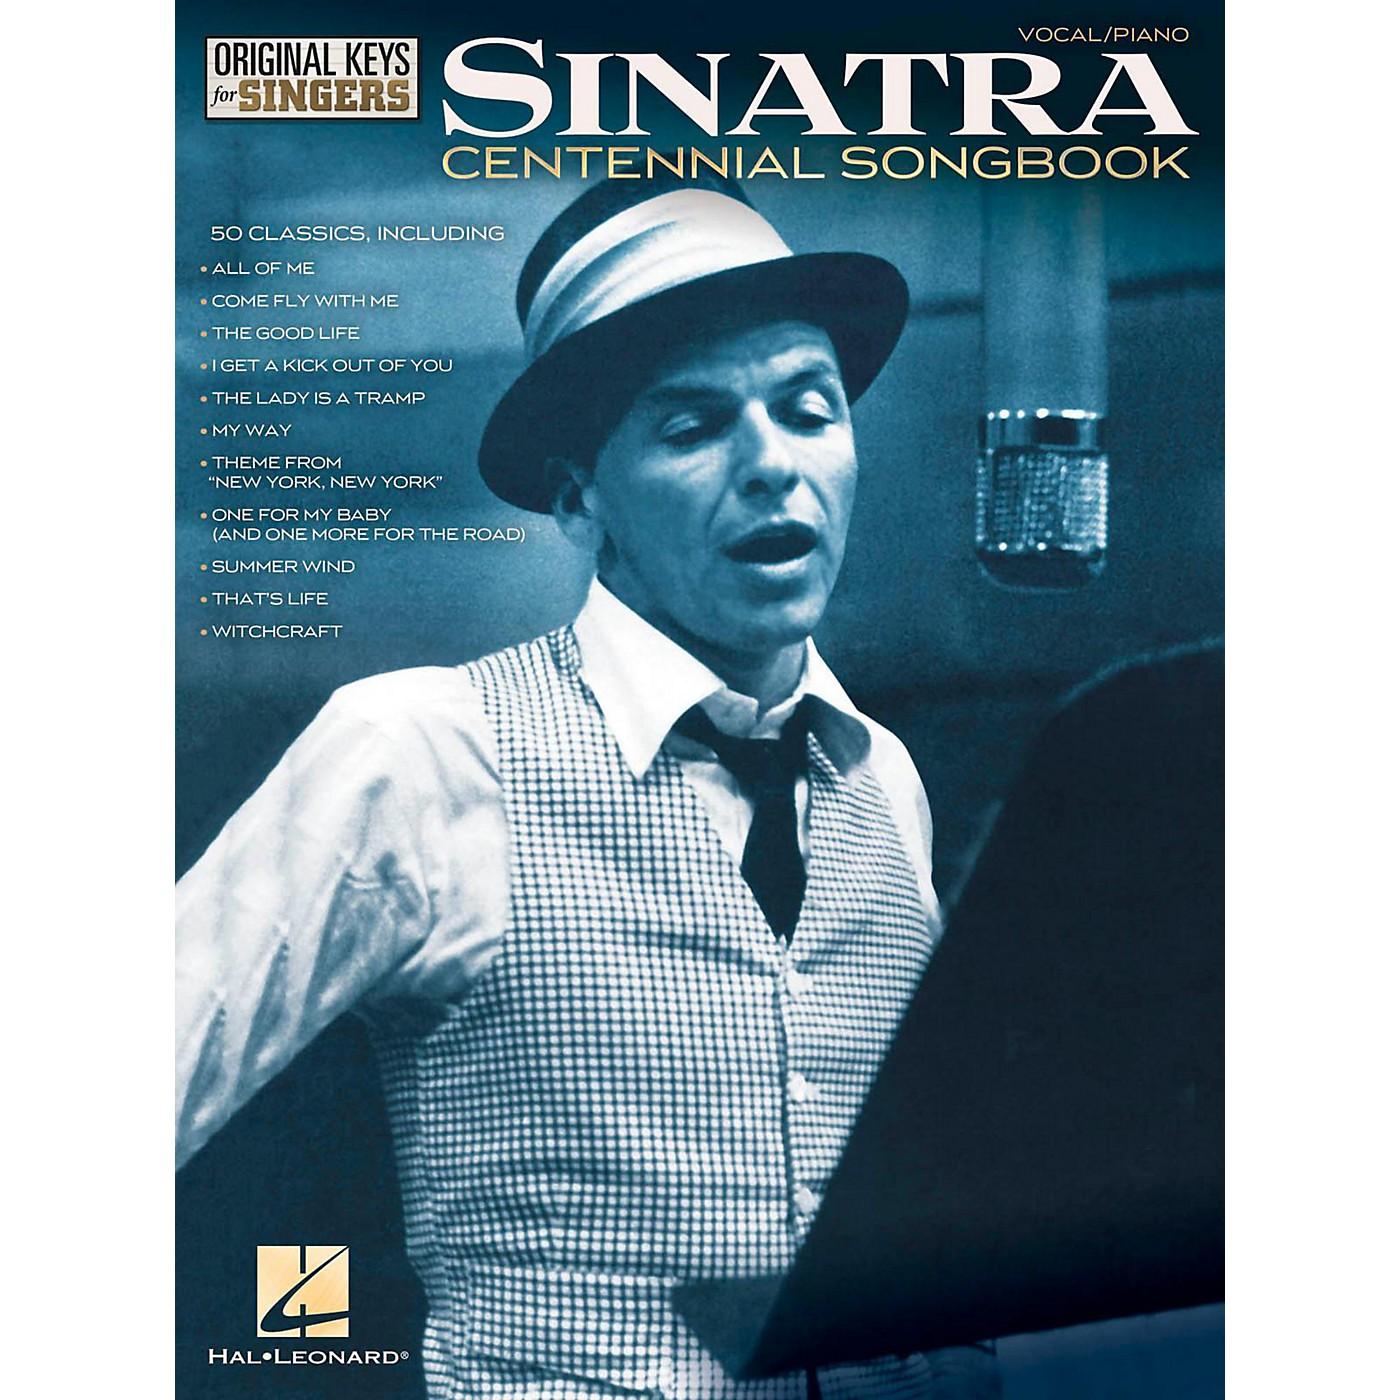 Hal Leonard Frank Sinatra Centennial Songbook - Original Keys For Singers thumbnail